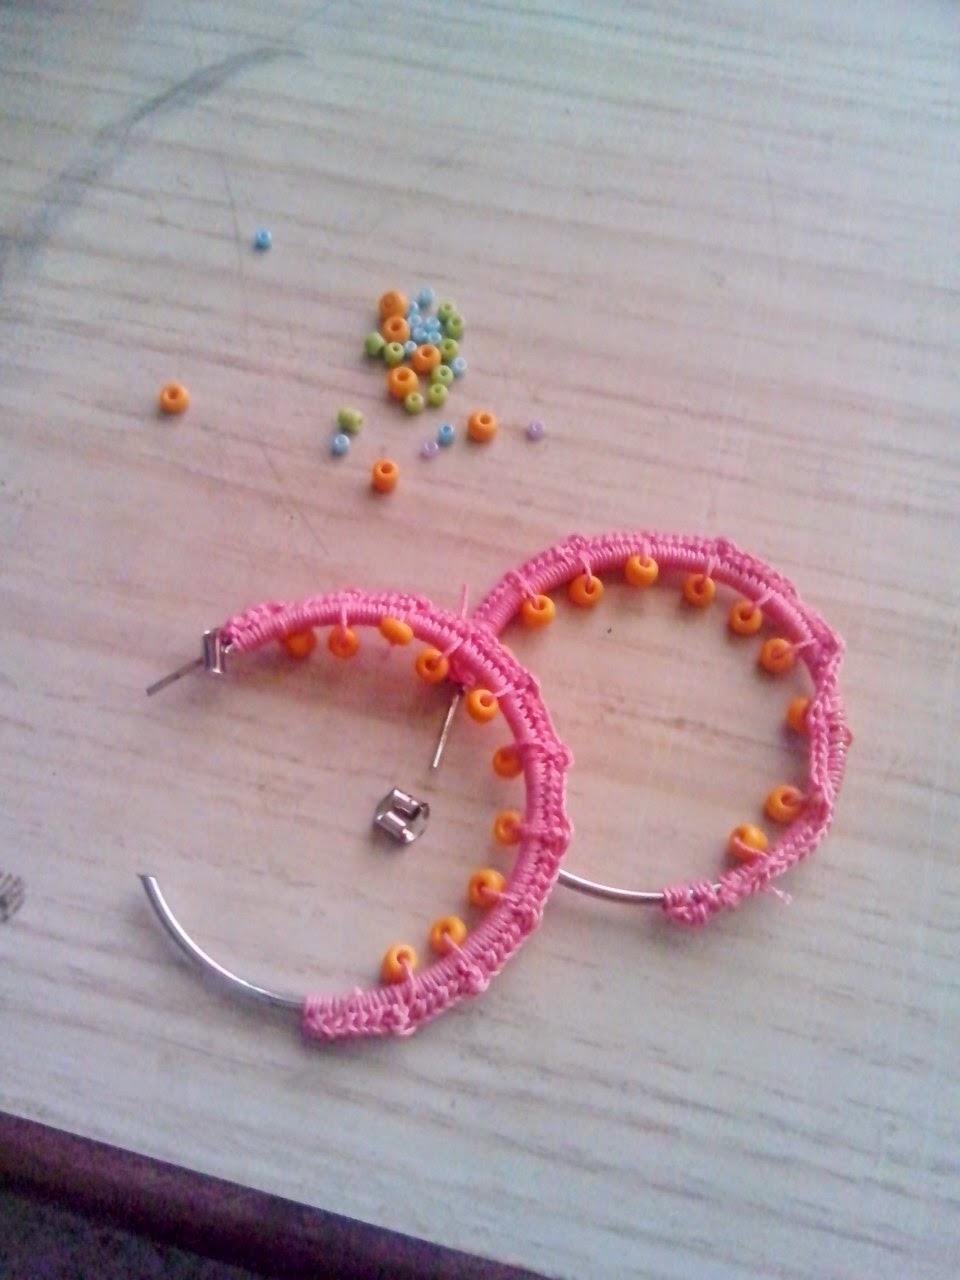 Embroidery Stitches In Coimbatore | Ausbeta.com